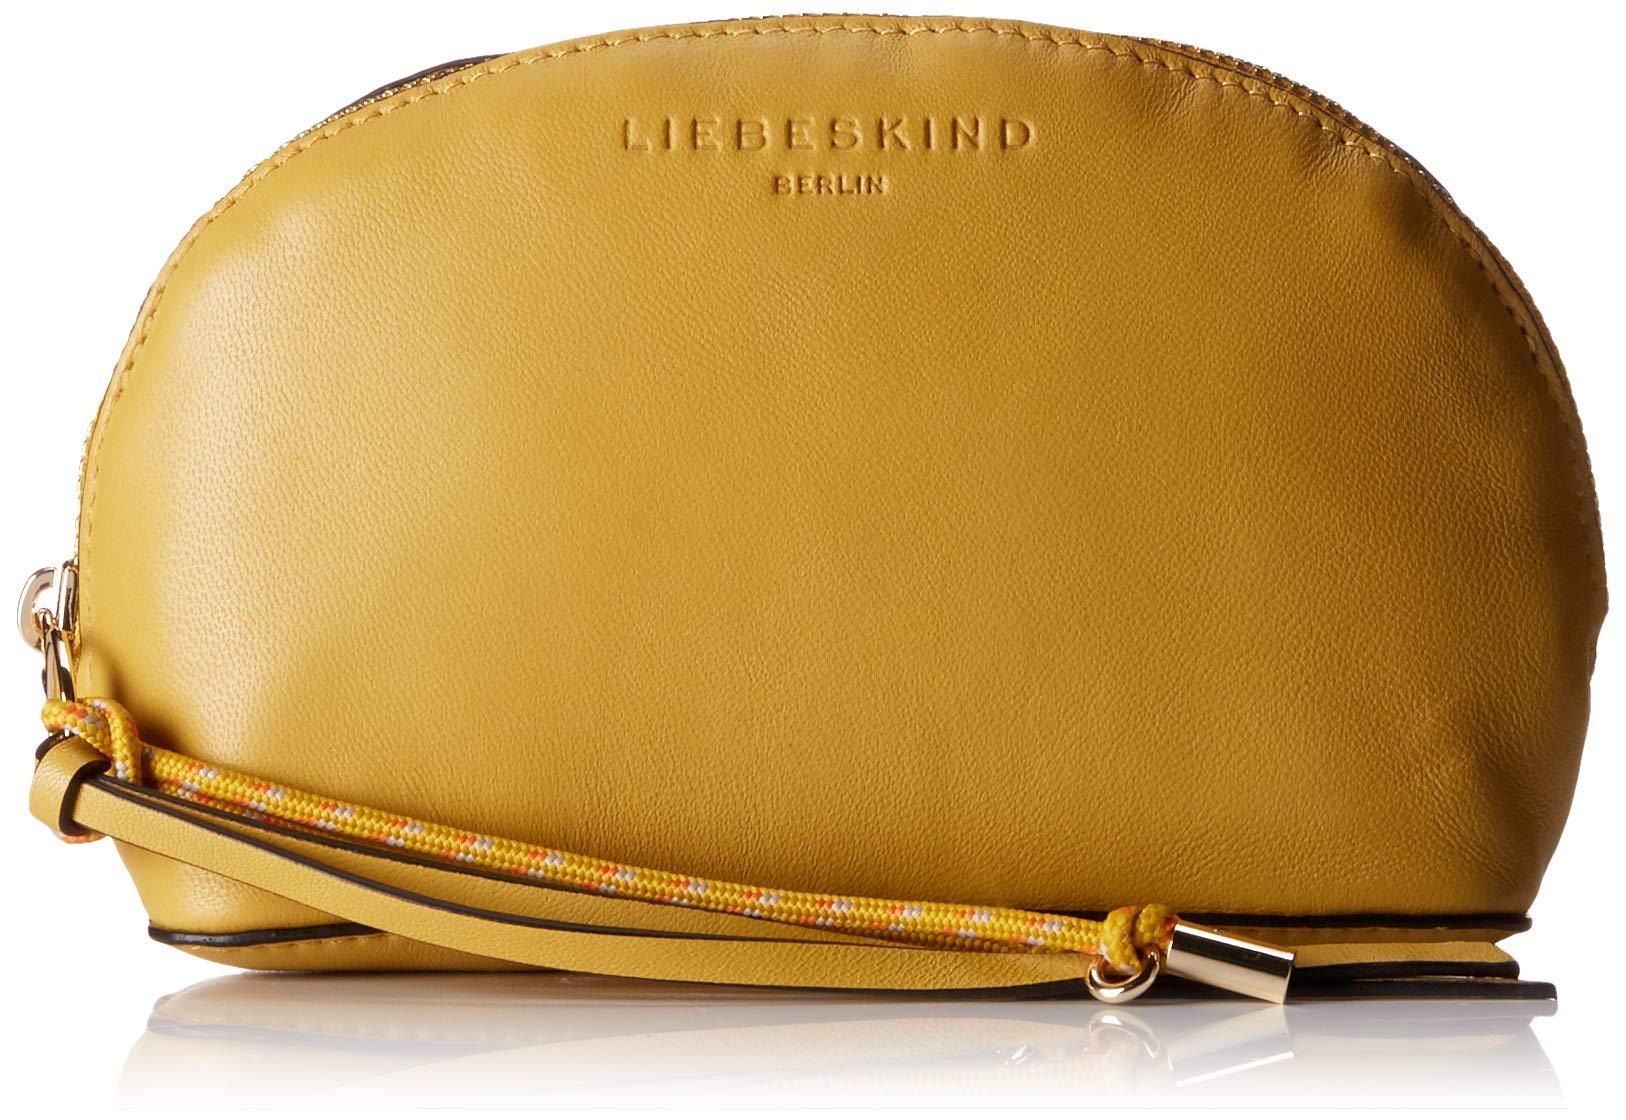 Cosmetic Liebeskind Cmw H SmallOrganiseurs Dive Main L Pouch Bag De Berlin FemmeJaunetawny X Sacs À Yellow7x12x18 b6yYf7g